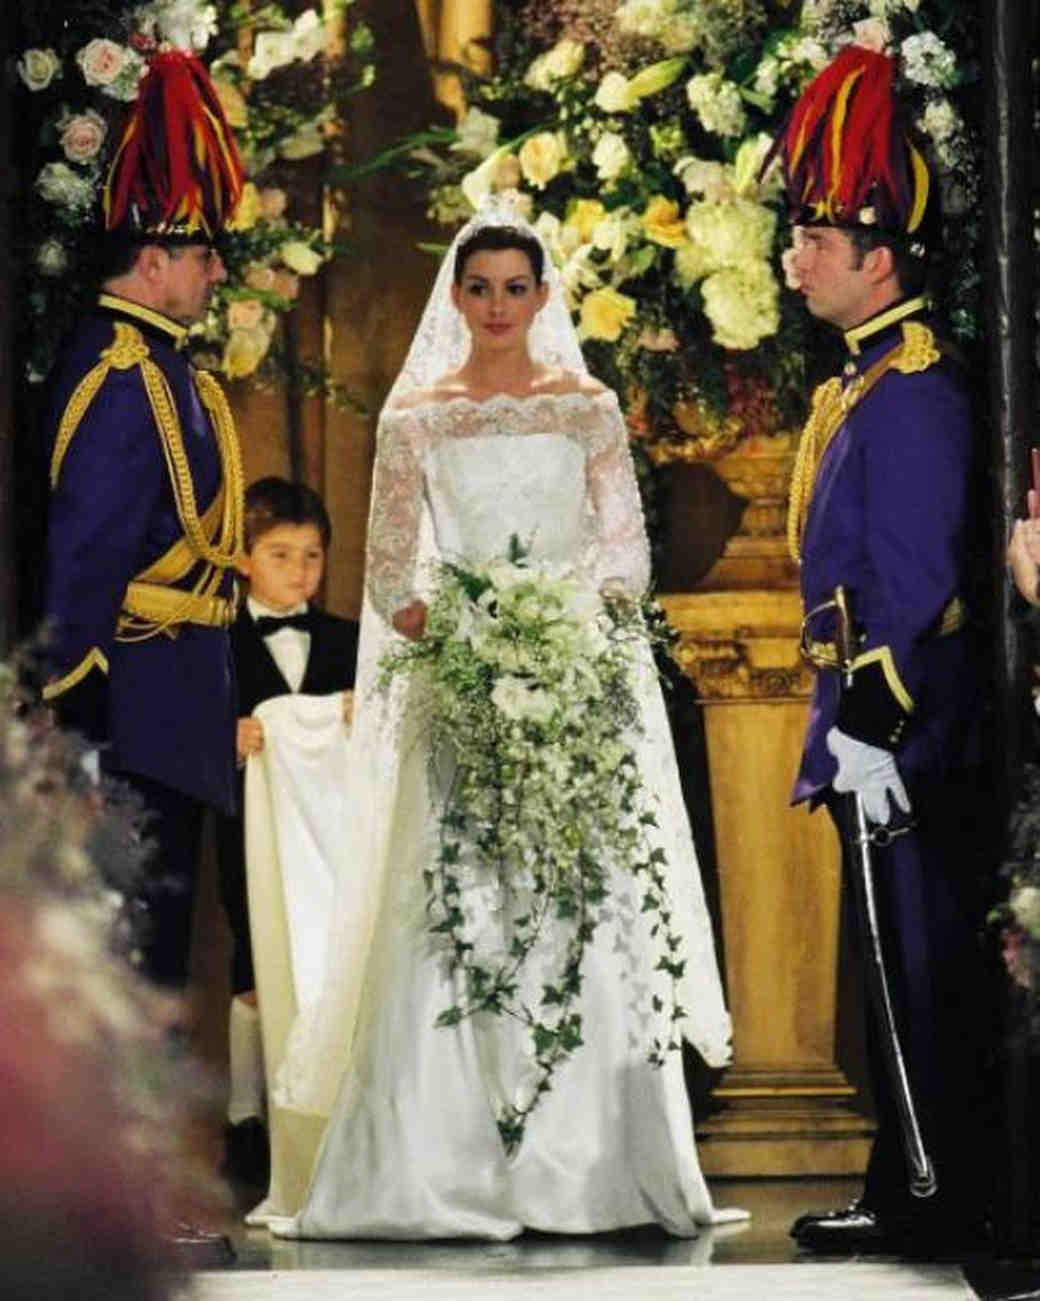 Neveletlen hercegnő esküvő